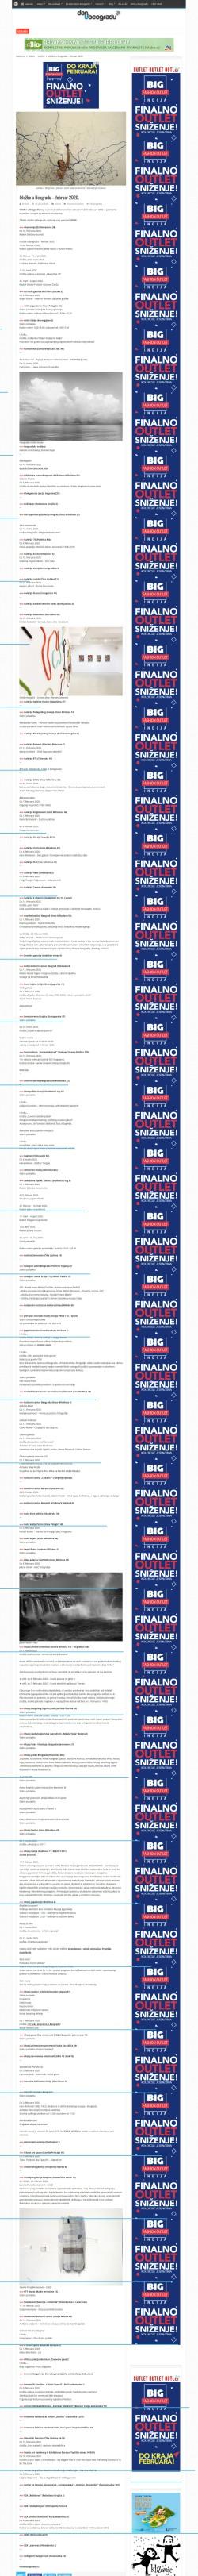 2801 - danubeogradu.rs - Izlozbe u Beogradu - februar 2020